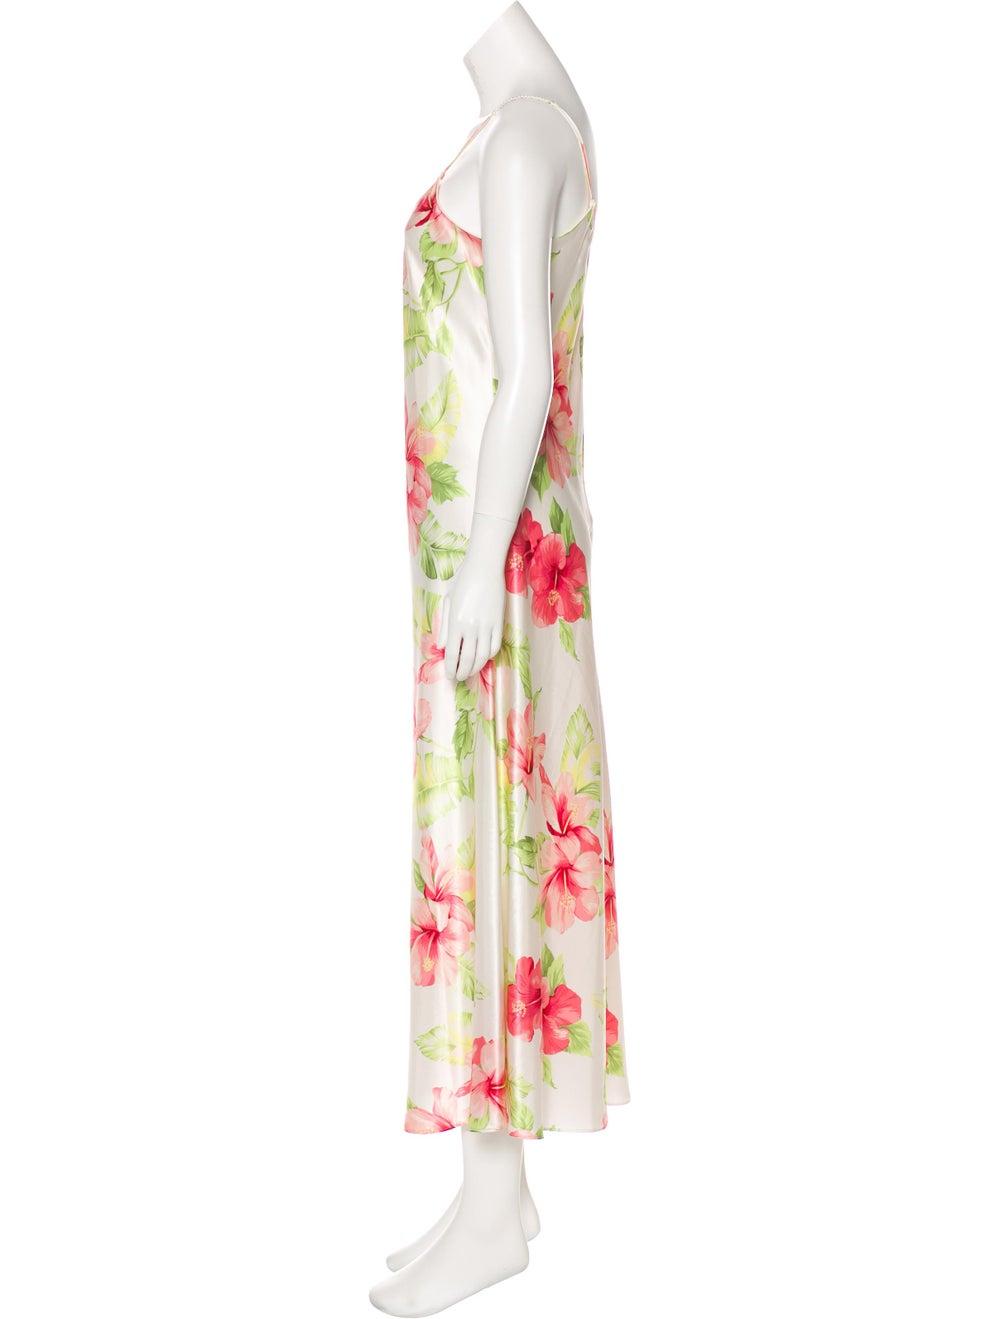 Oscar de la Renta Hibiscus Maxi Dress White - image 2